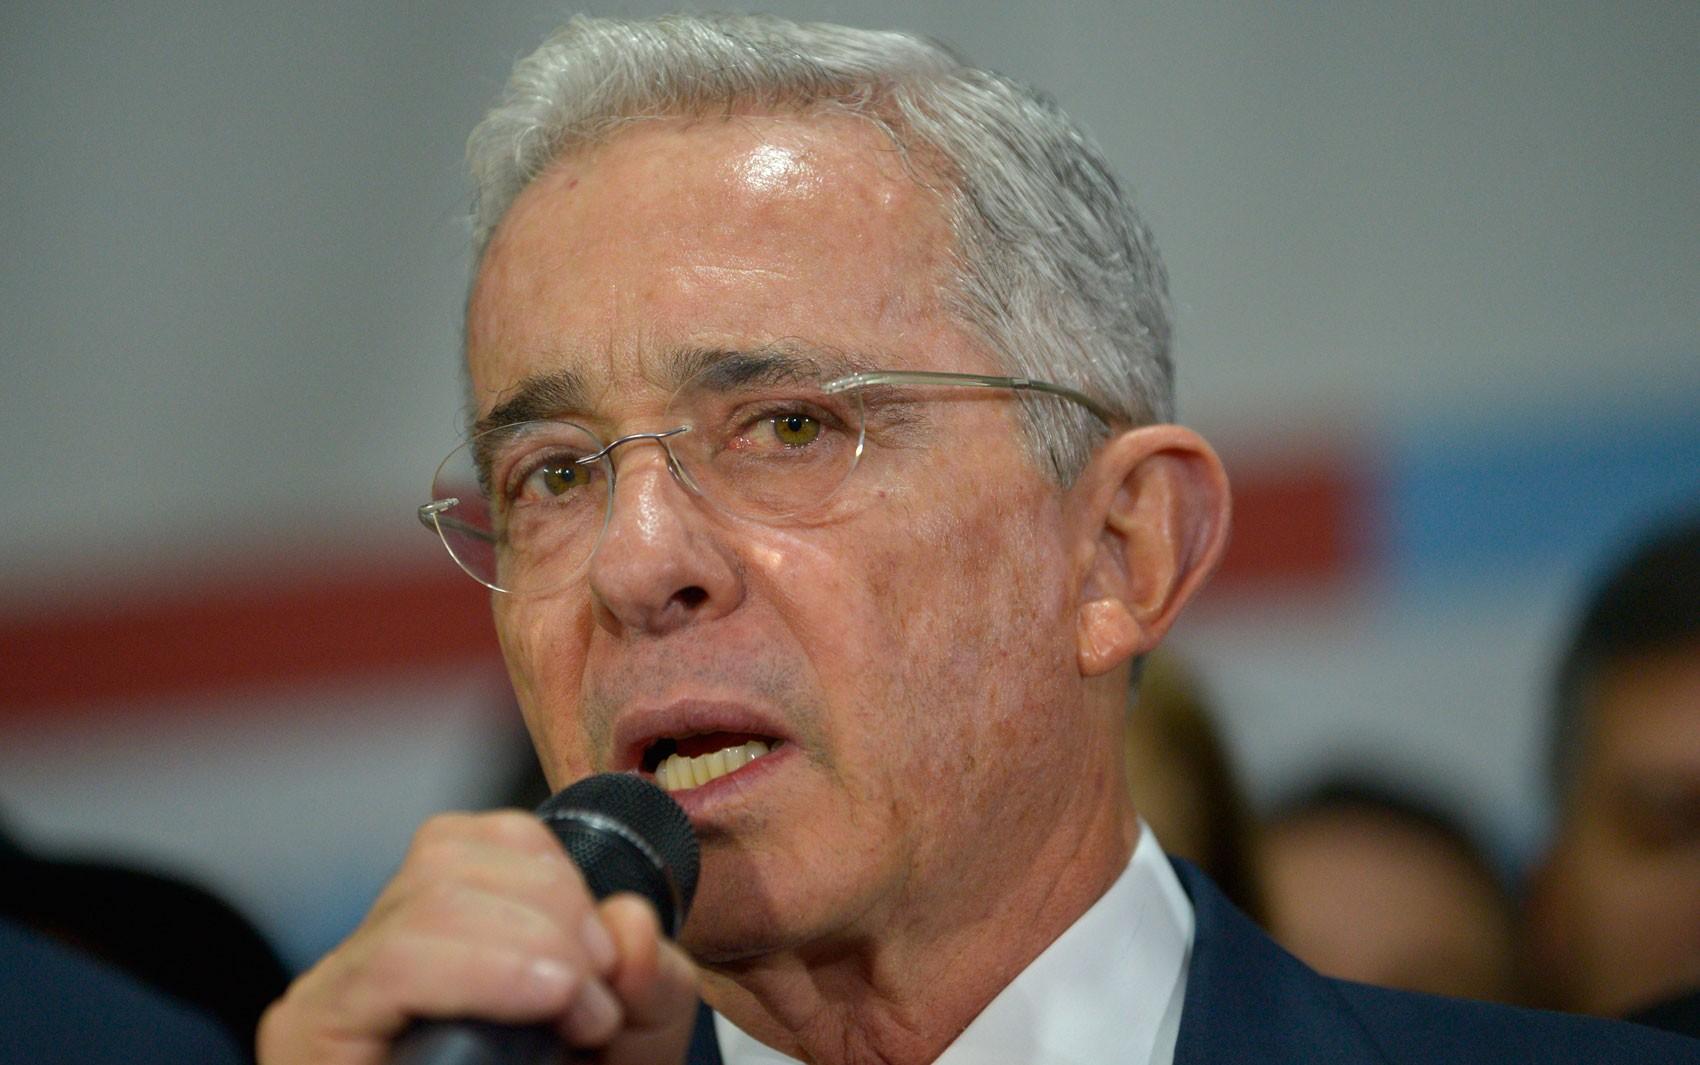 Mais de 100 homicídios: general do exército colombiano será acusado de crimes cometidos entre 2007 e 2008